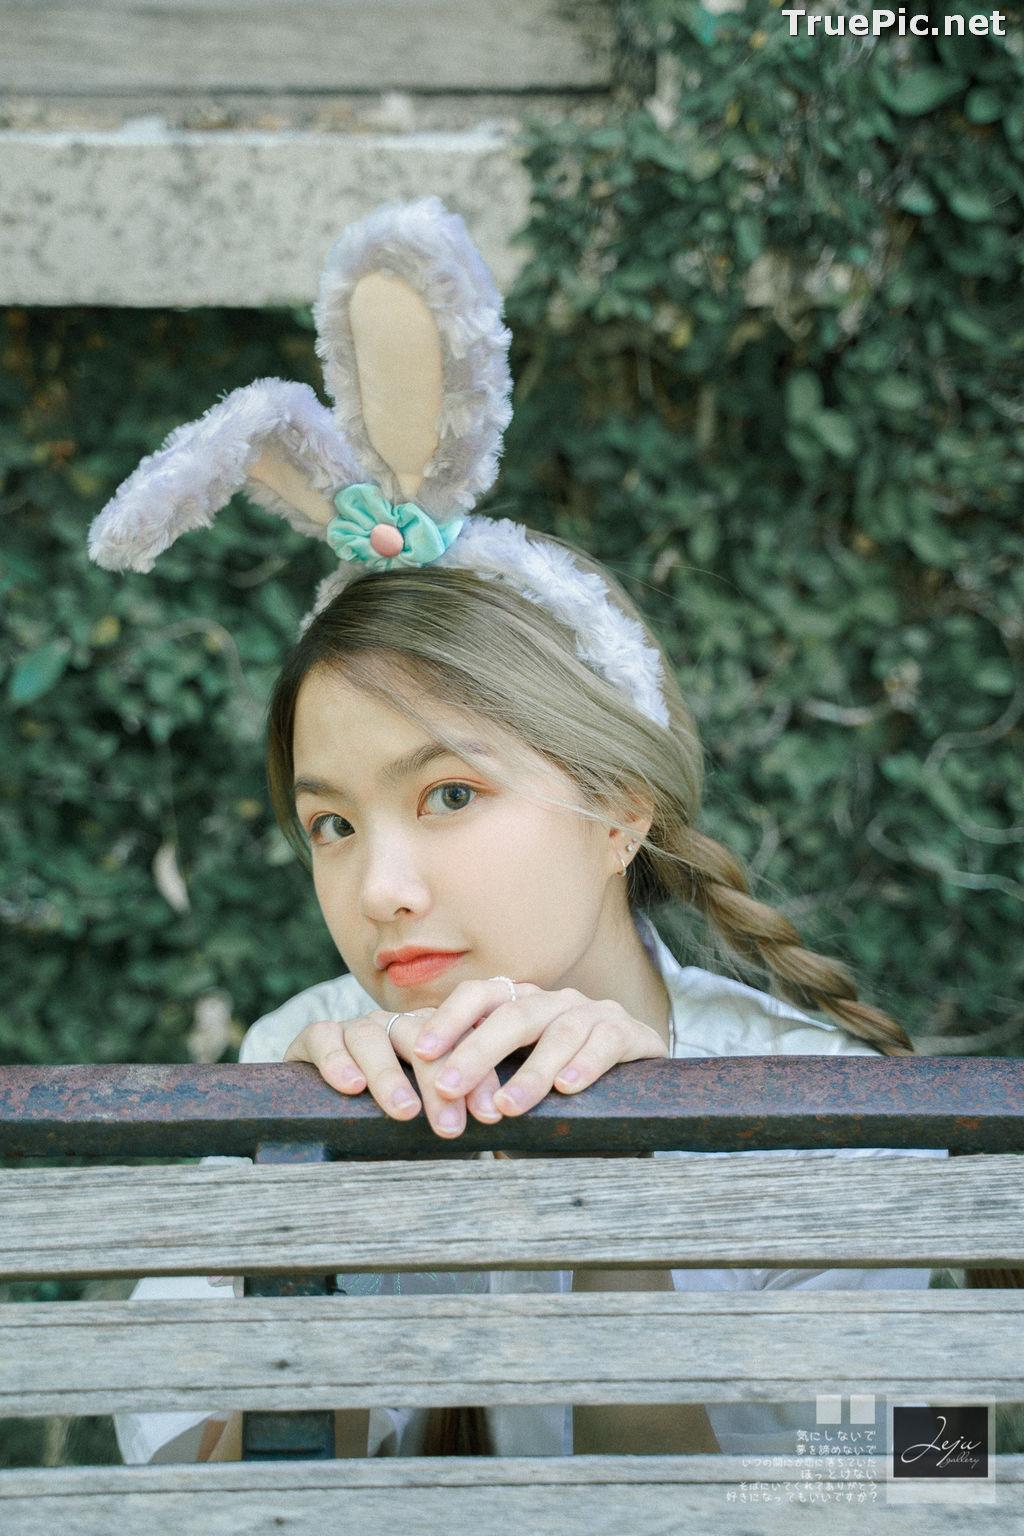 Image Thailand Cute Model - Napat Cdhg - Gam Bunny Girl - TruePic.net - Picture-10